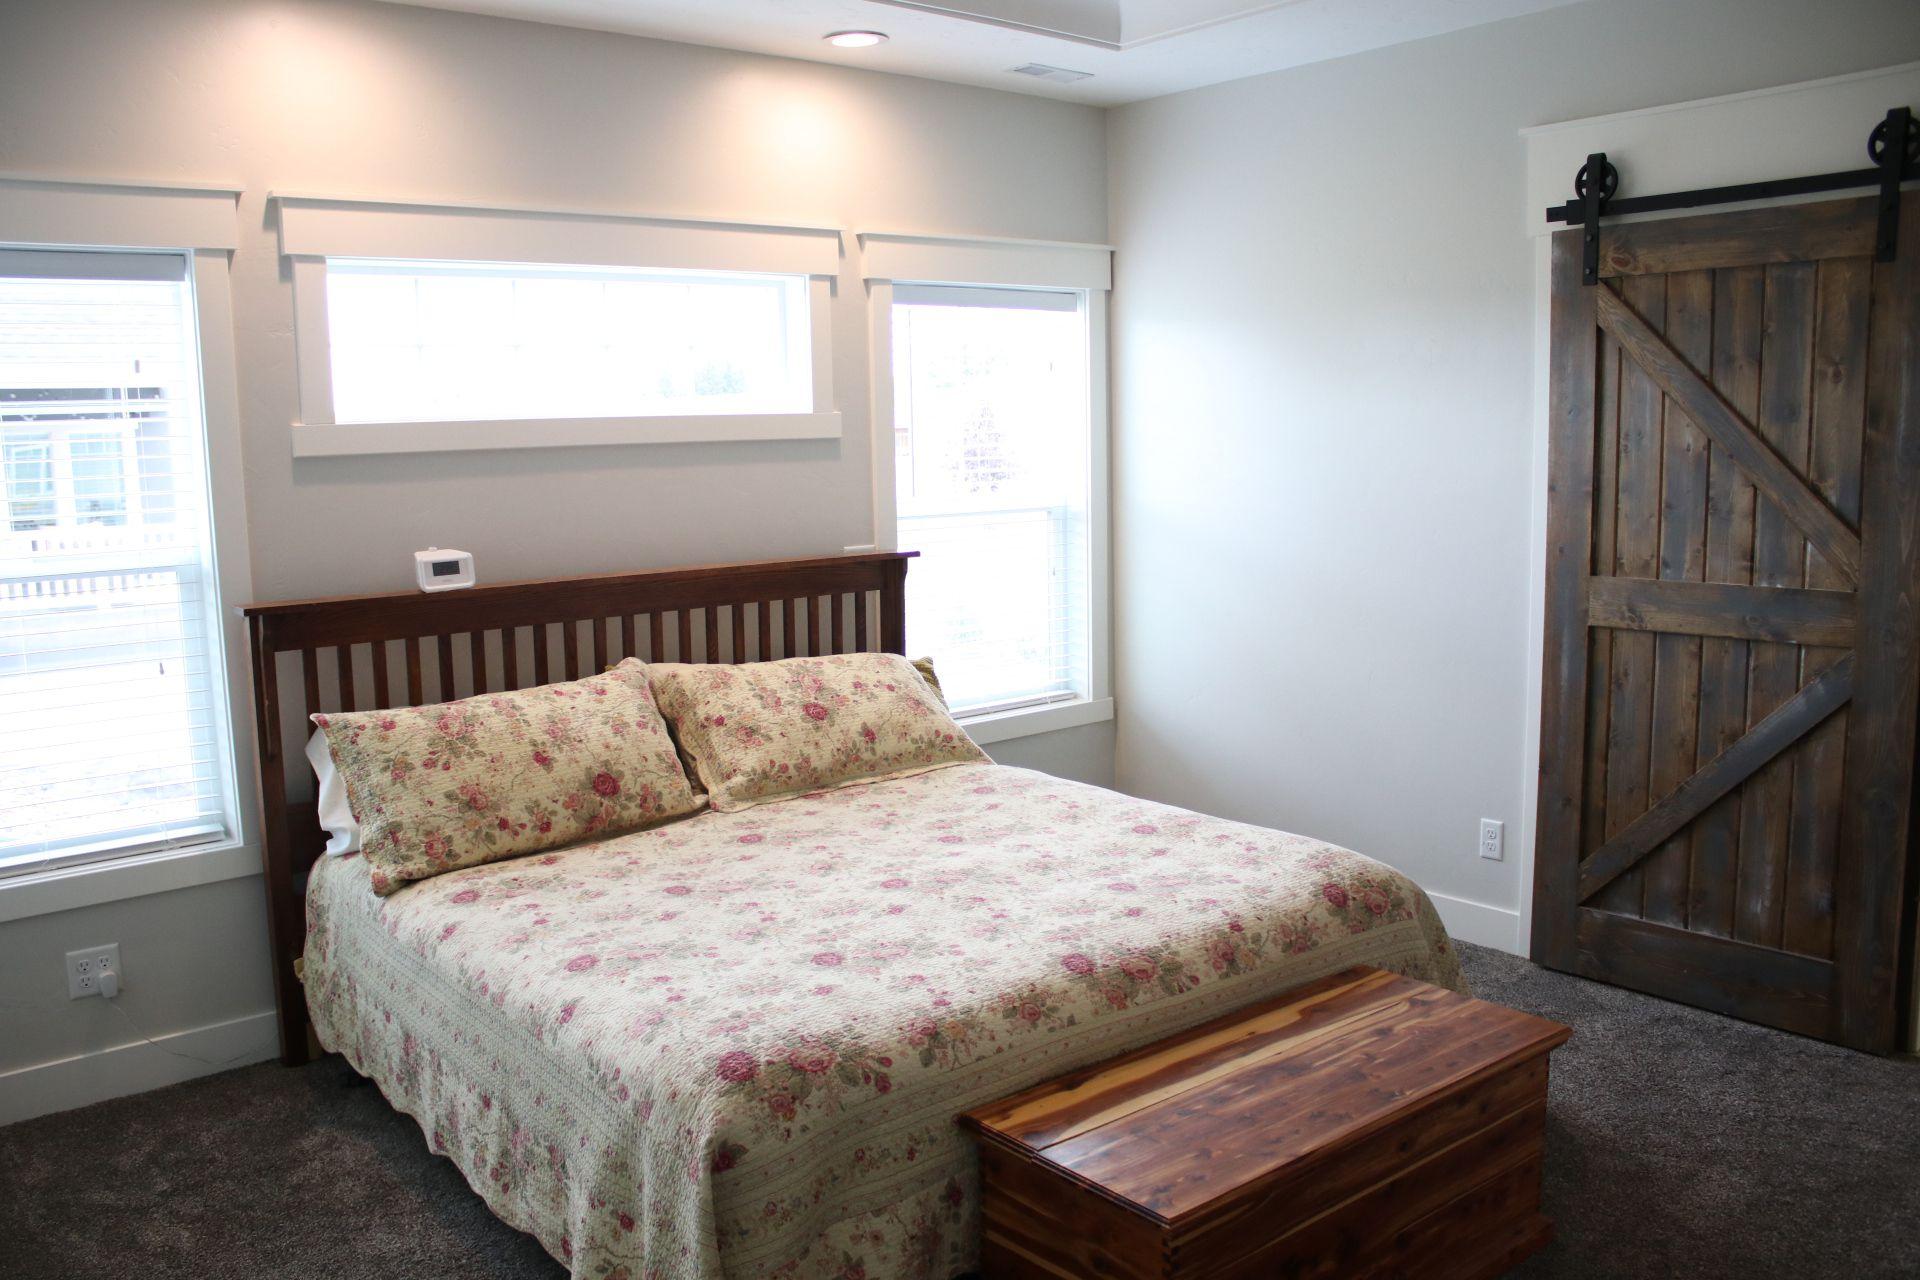 9006 E Cedar Point Ln Idaho Falls Id 83401 5 Bed 4 Bath 29 Photos Trulia